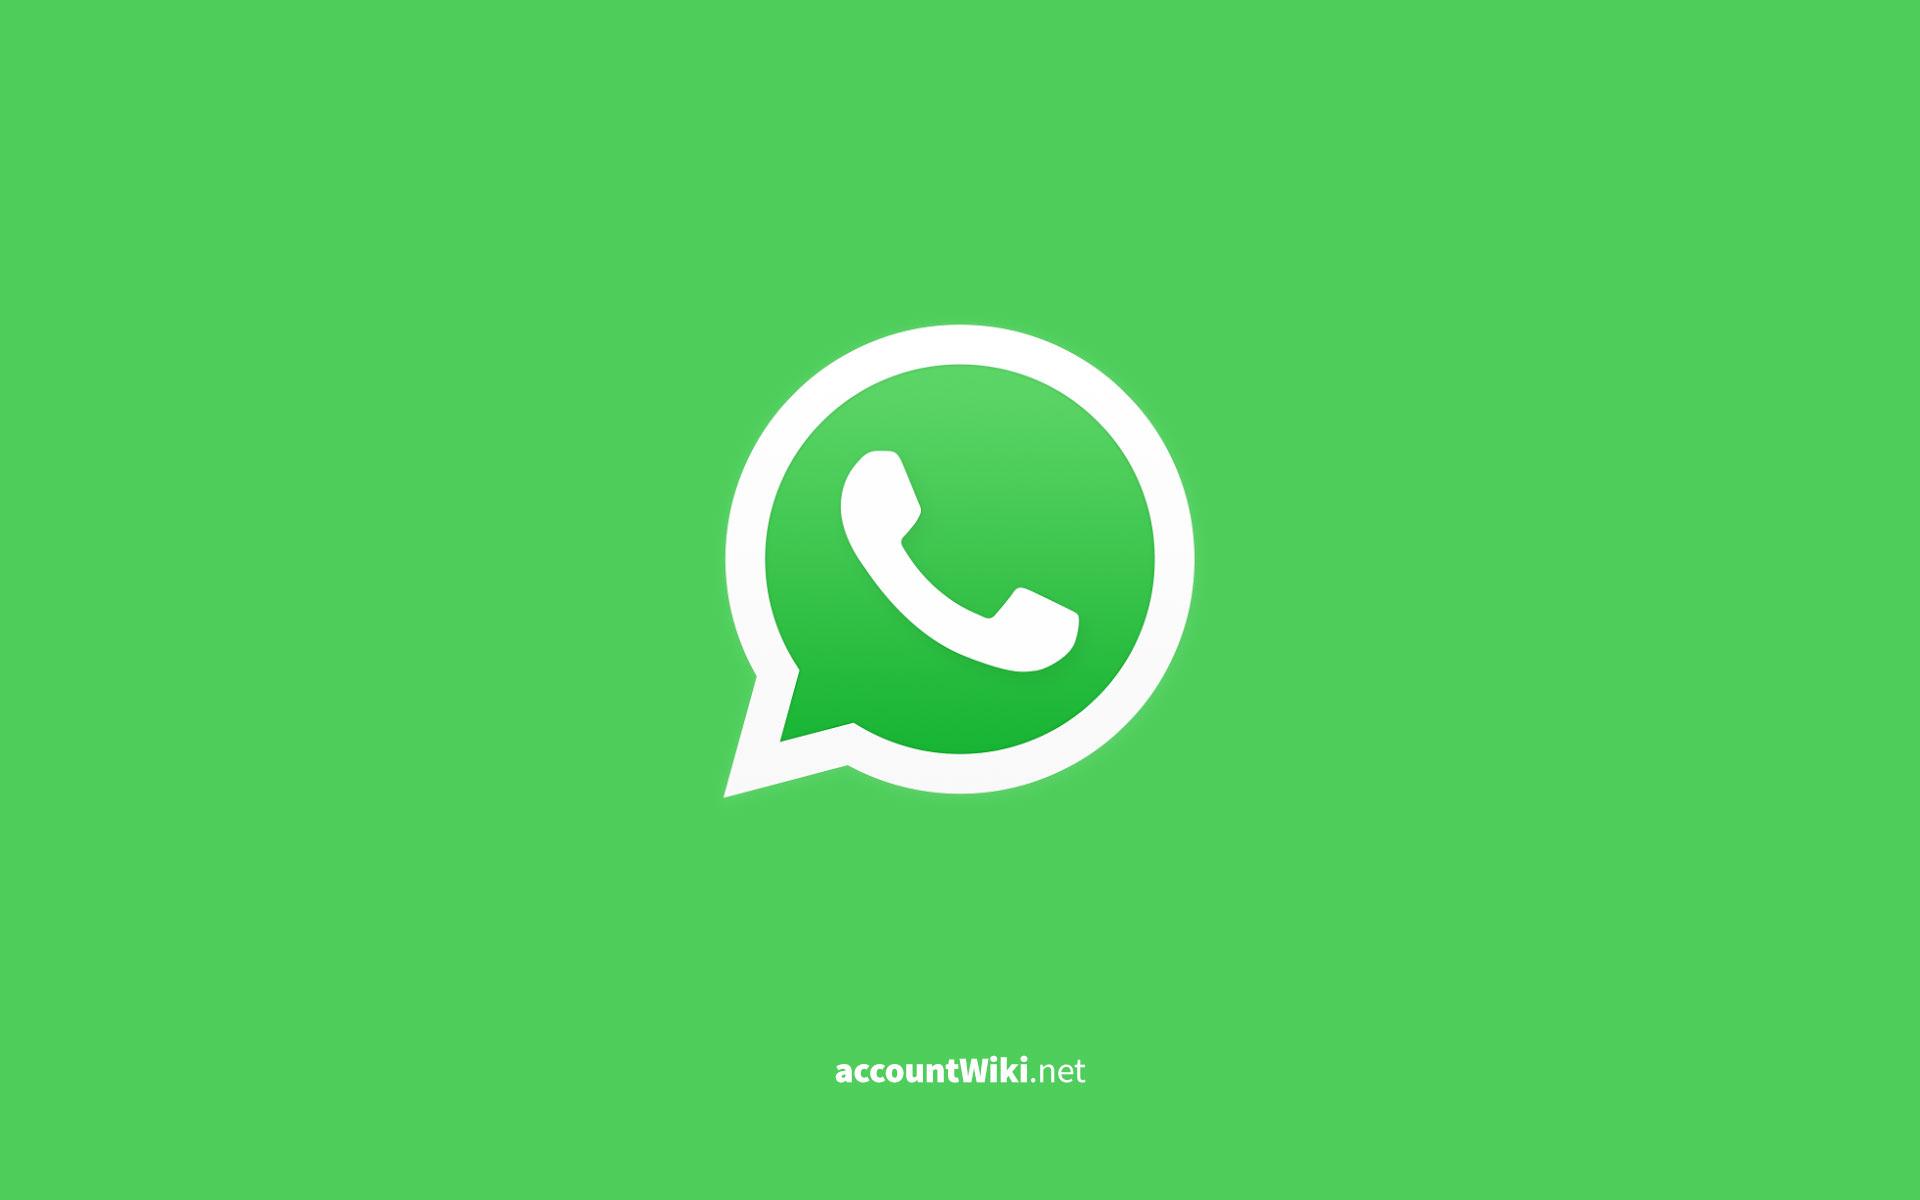 Whatsapp Download - accountWiki.net